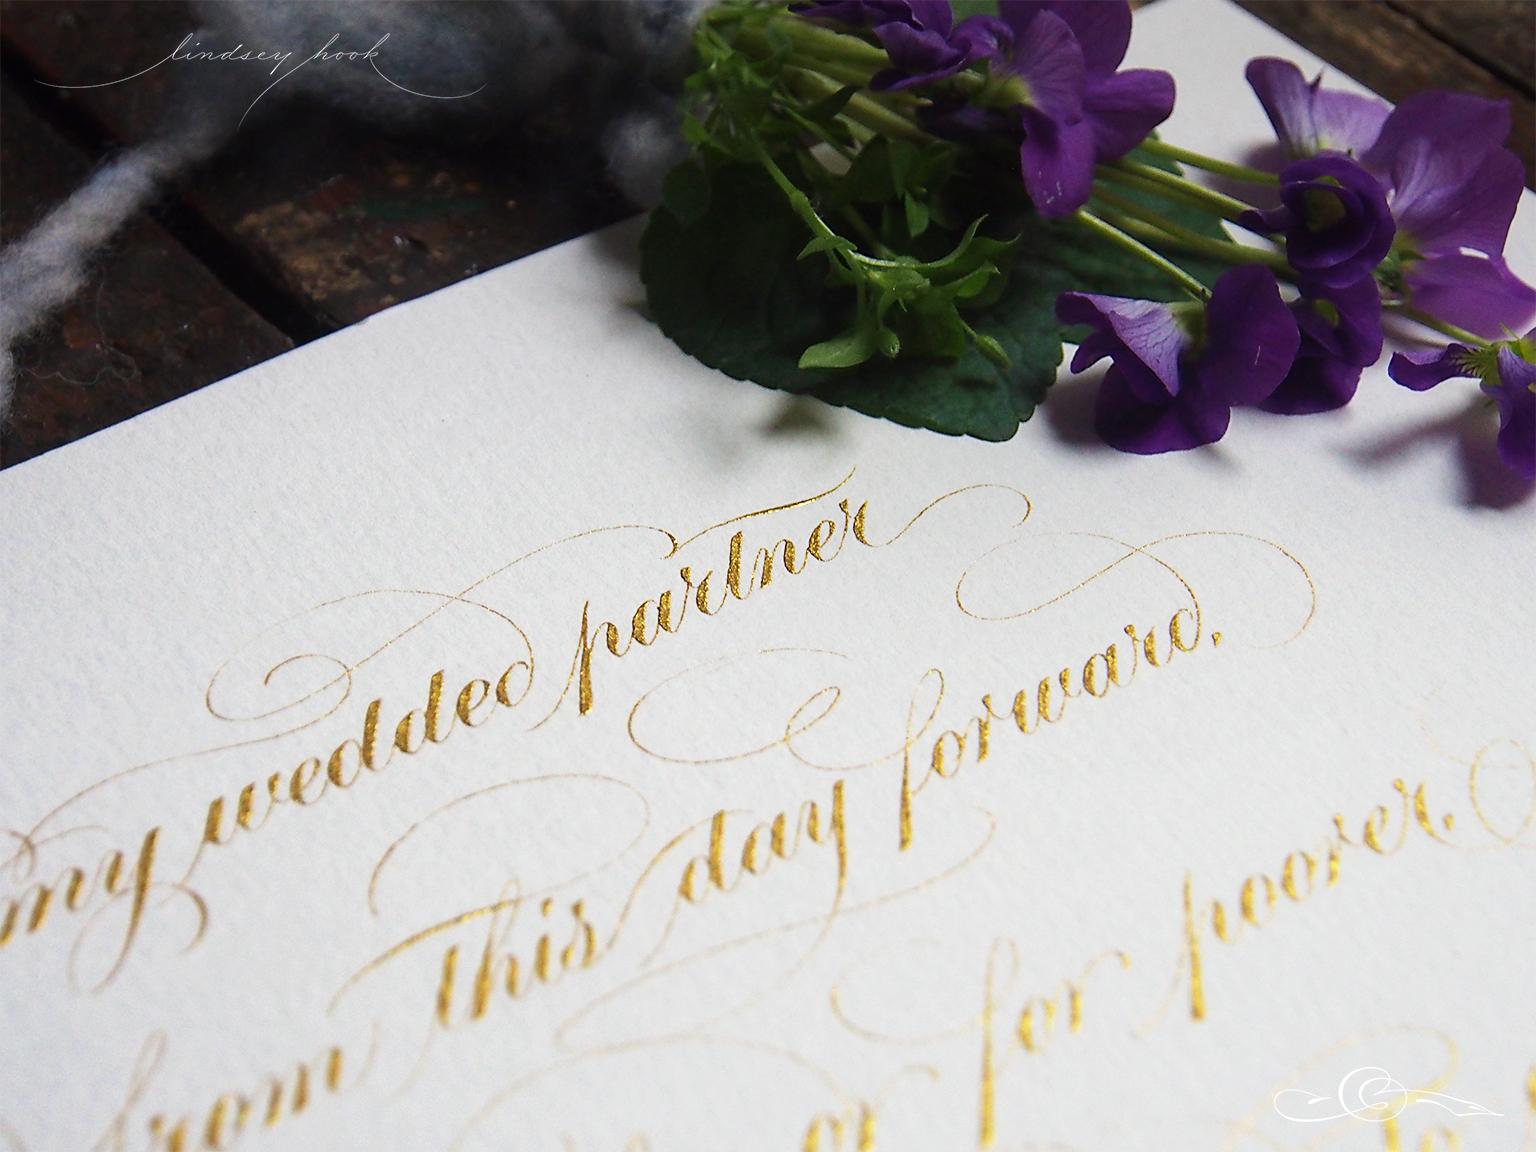 Wedding Vows (detail)